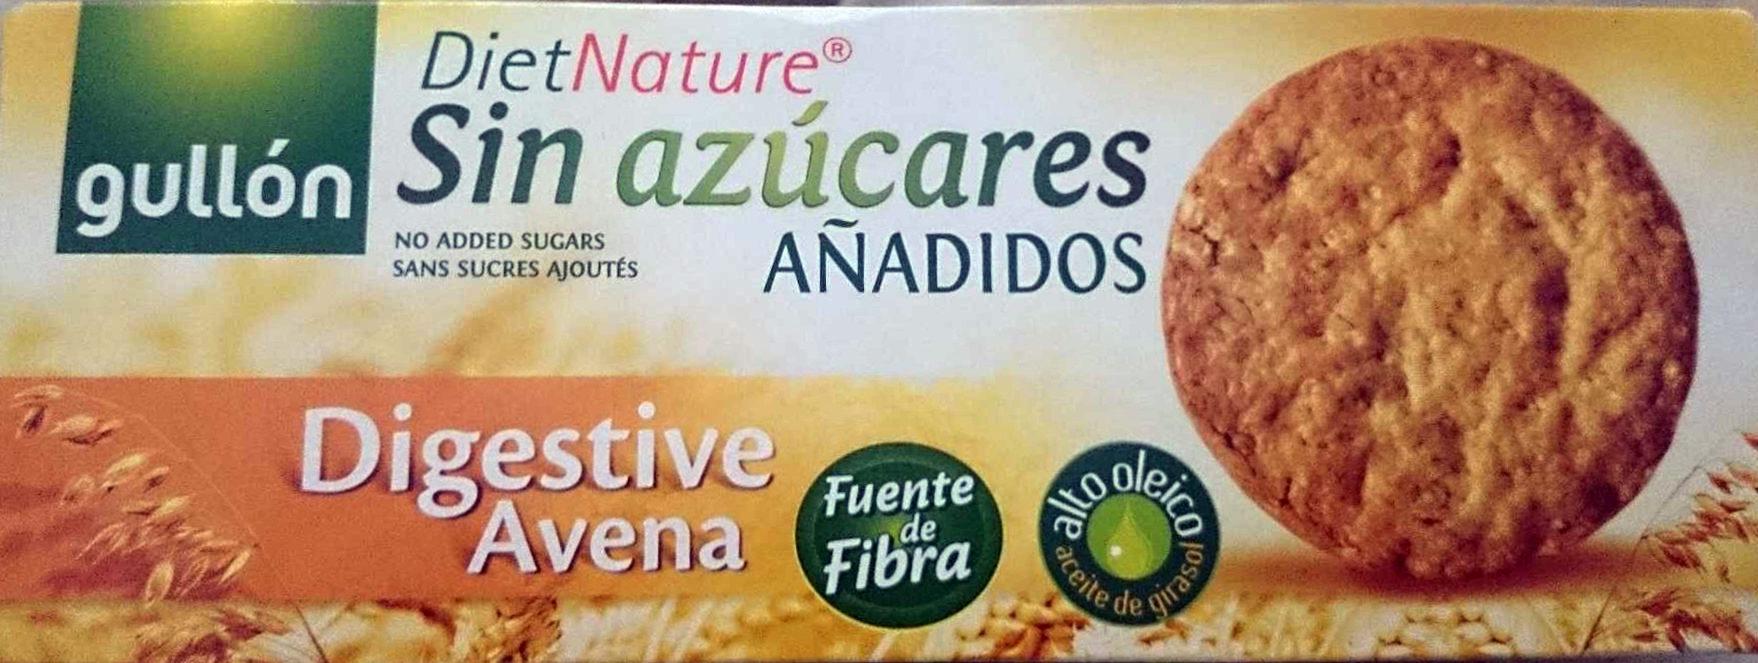 Digestive Avena - Producto